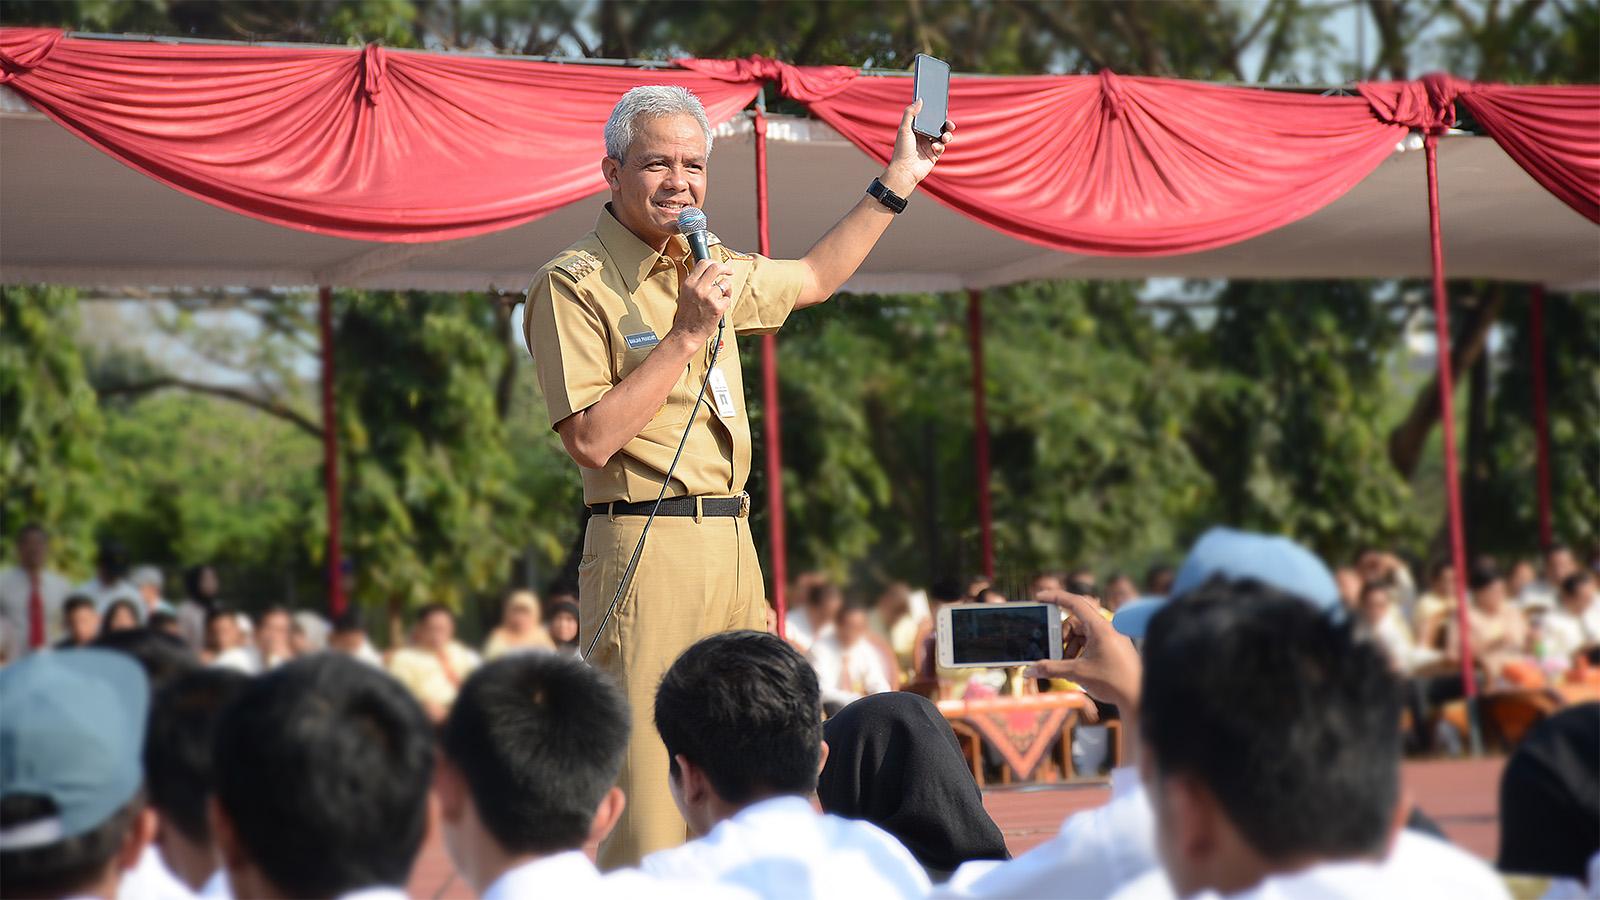 Gubernur Jateng Ganjar Pranowo: Generasi Milenial yang Berprestasi dan Berkarakter